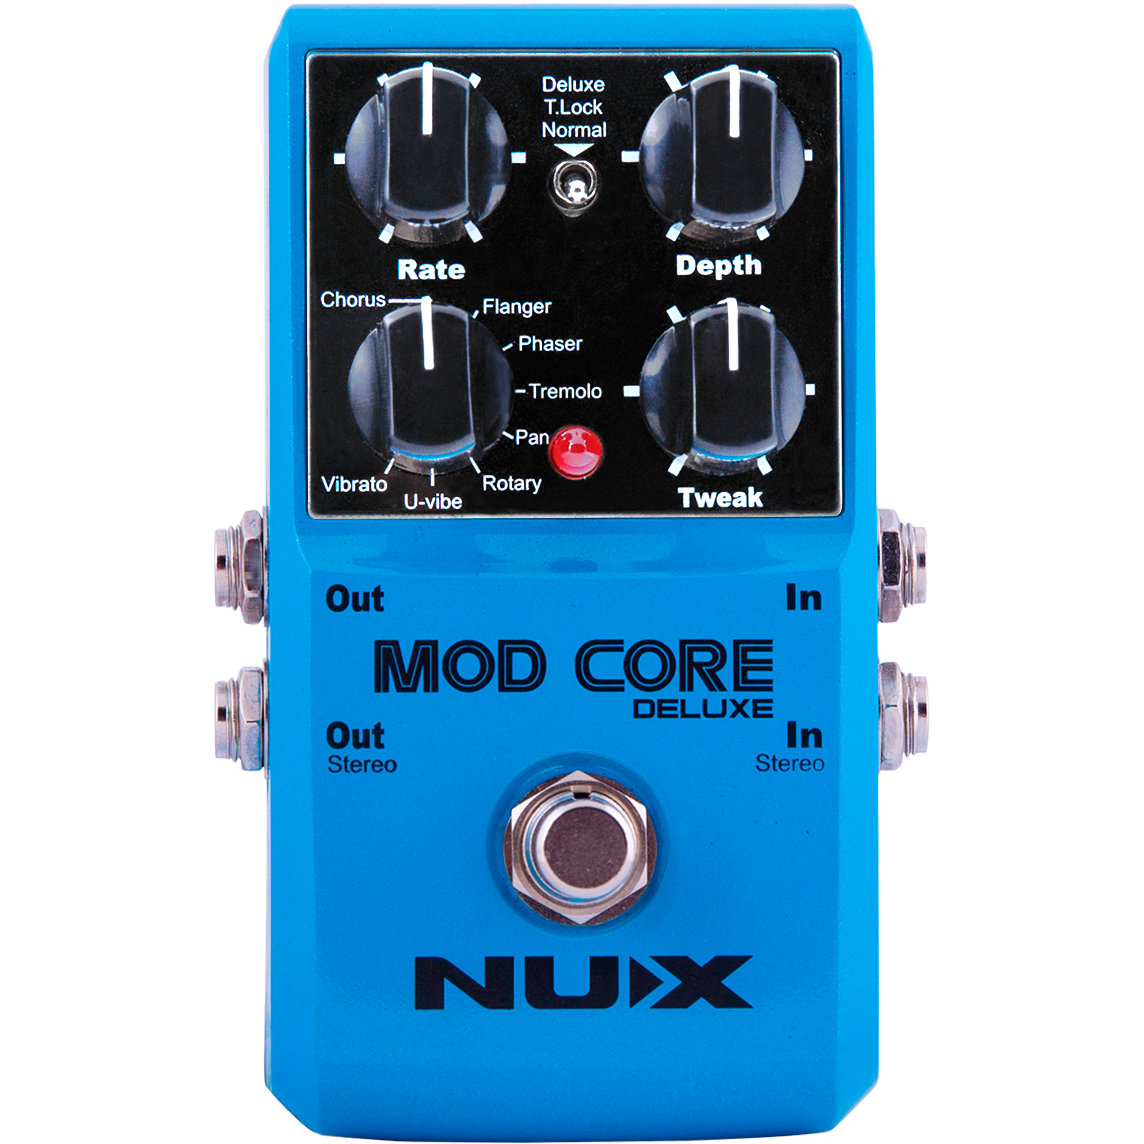 Billede af Nux Mod CoreDeluxe multieffekt guitar-pedal